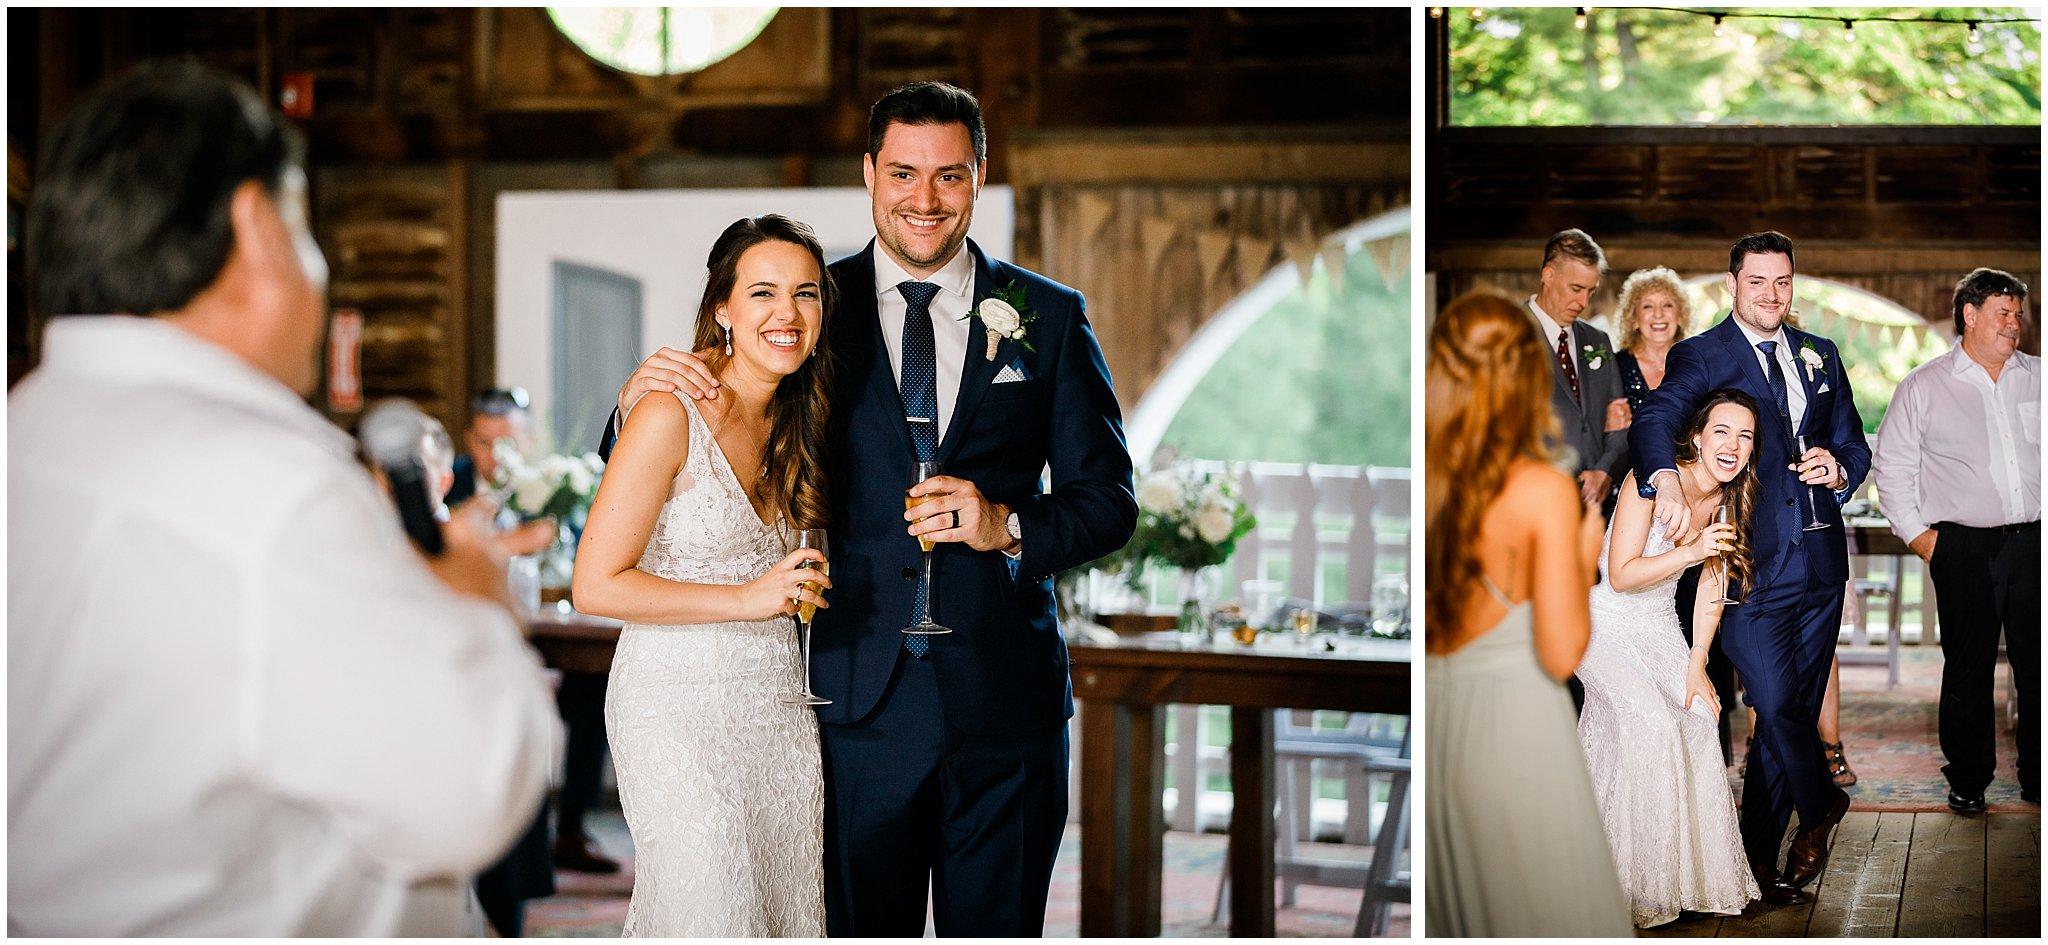 Hudson Valley Weddings at the Hill Hudson New York Wedding Photographer90.jpg